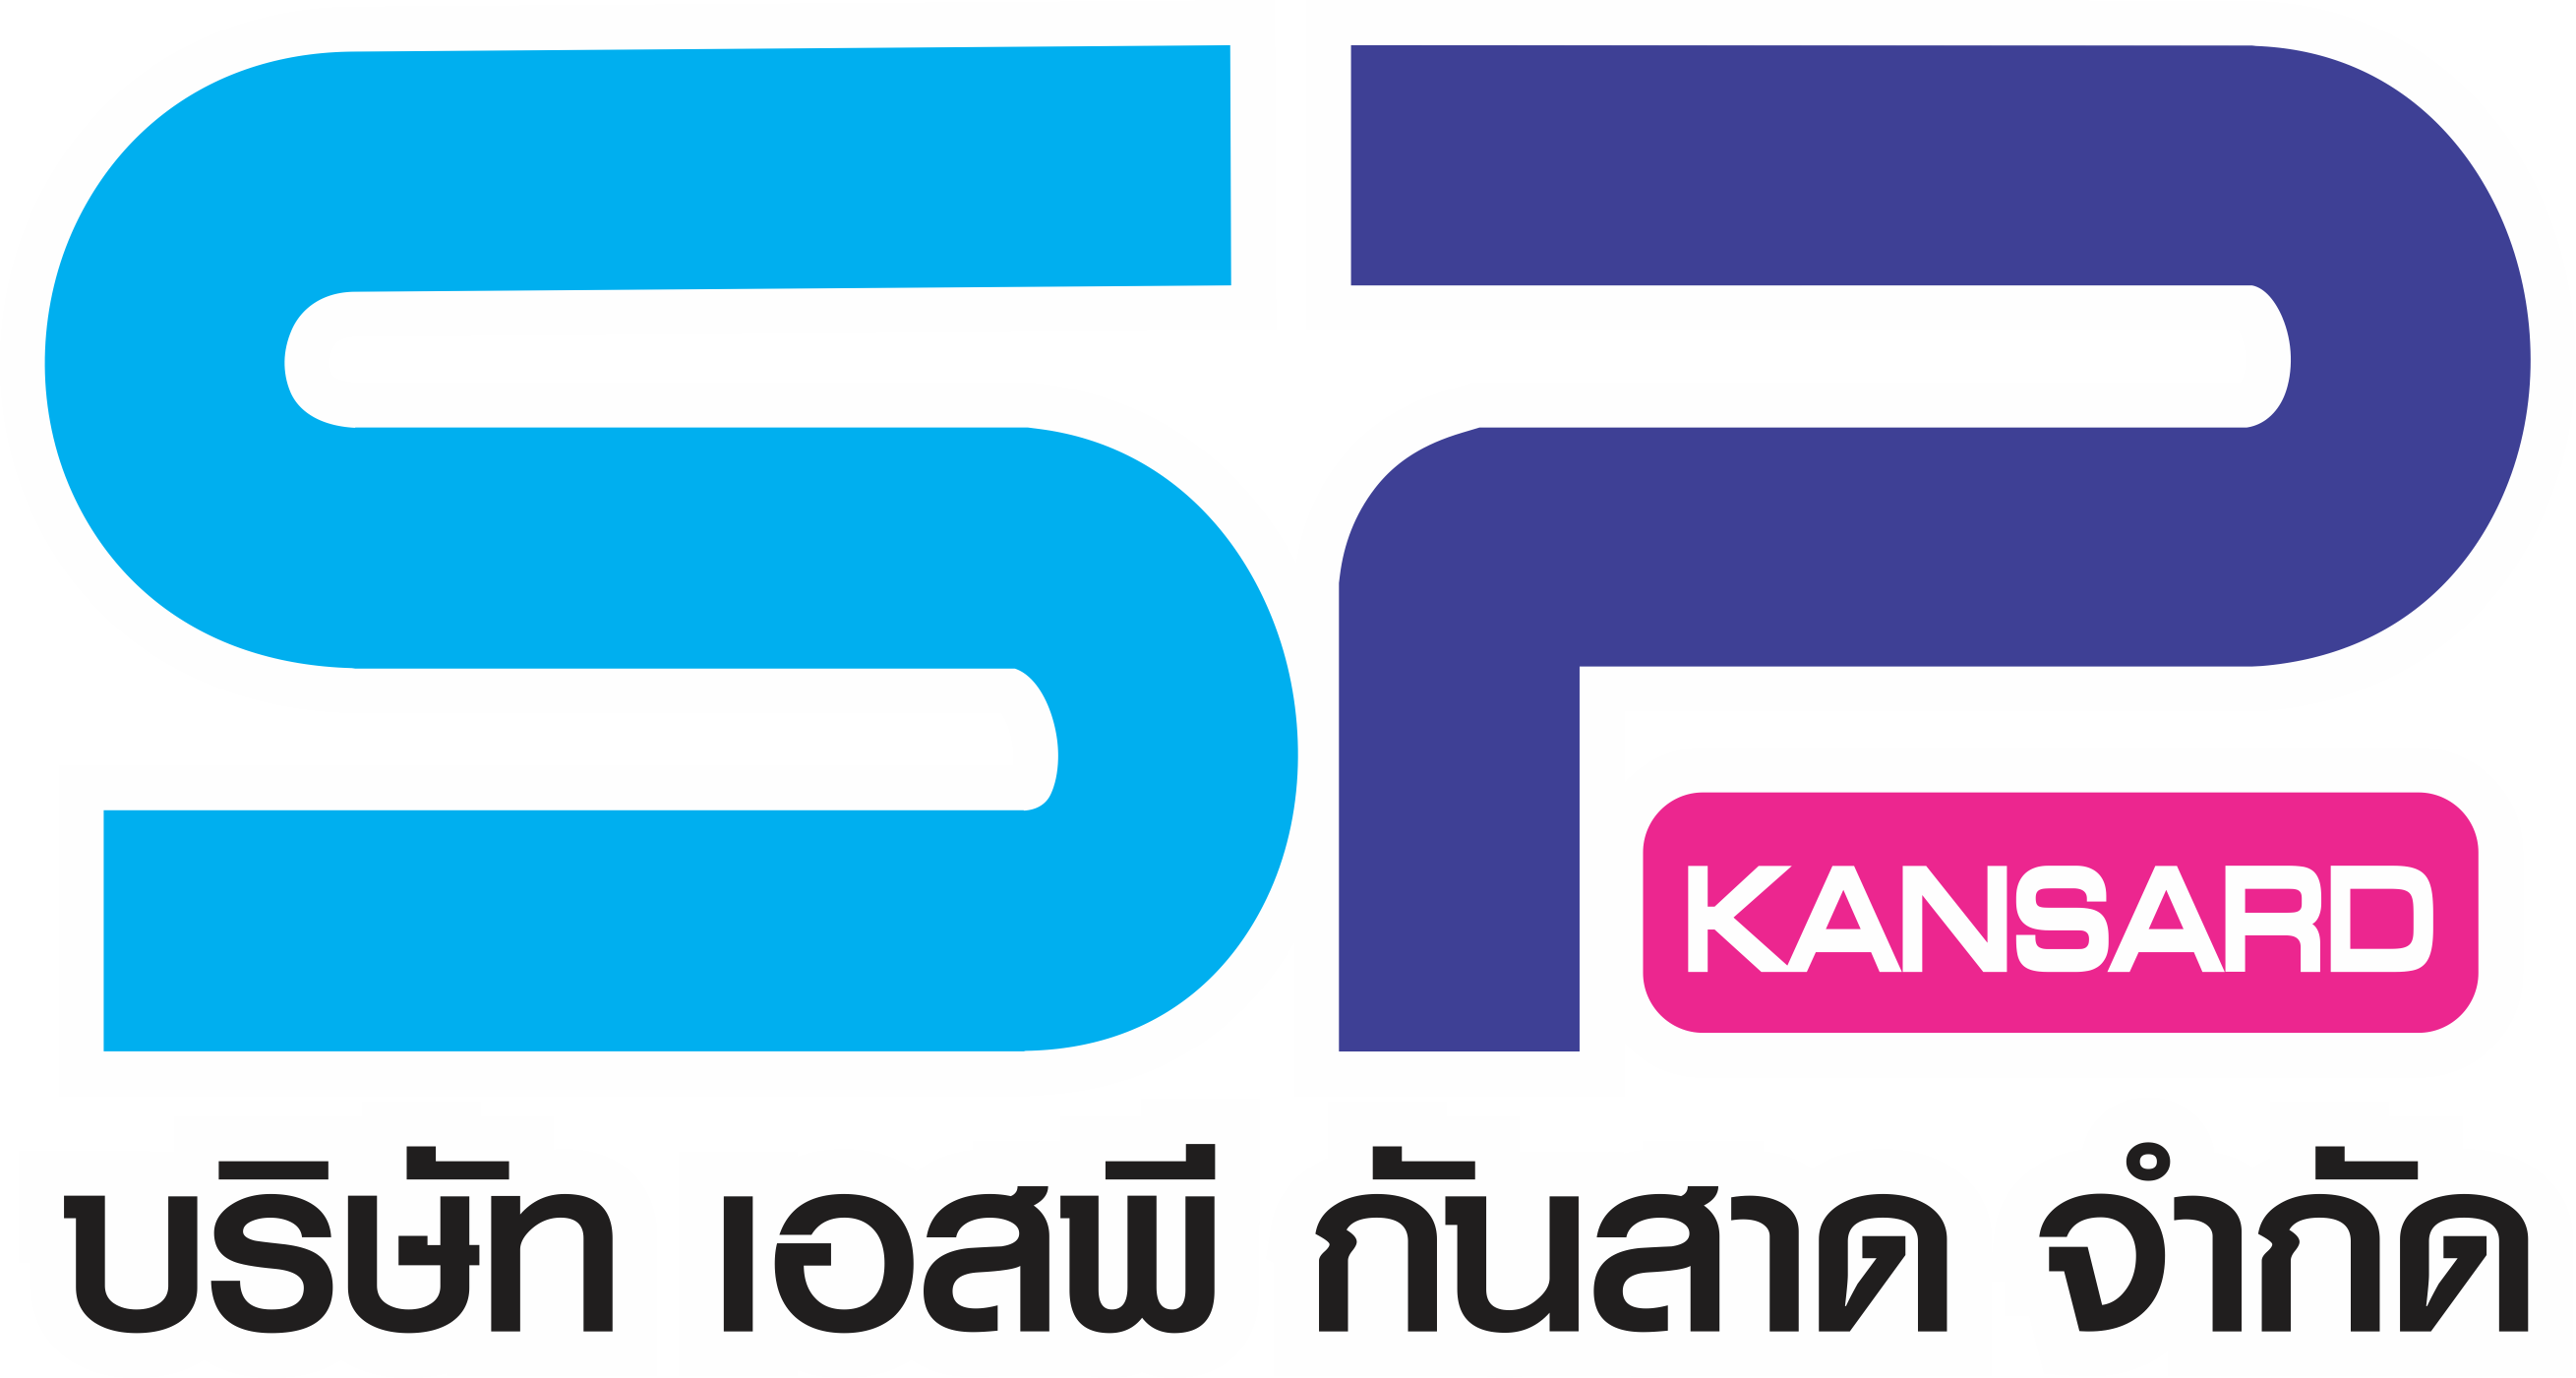 SP-KANSARD บริษัท เอสพี กันสาด จำกัด